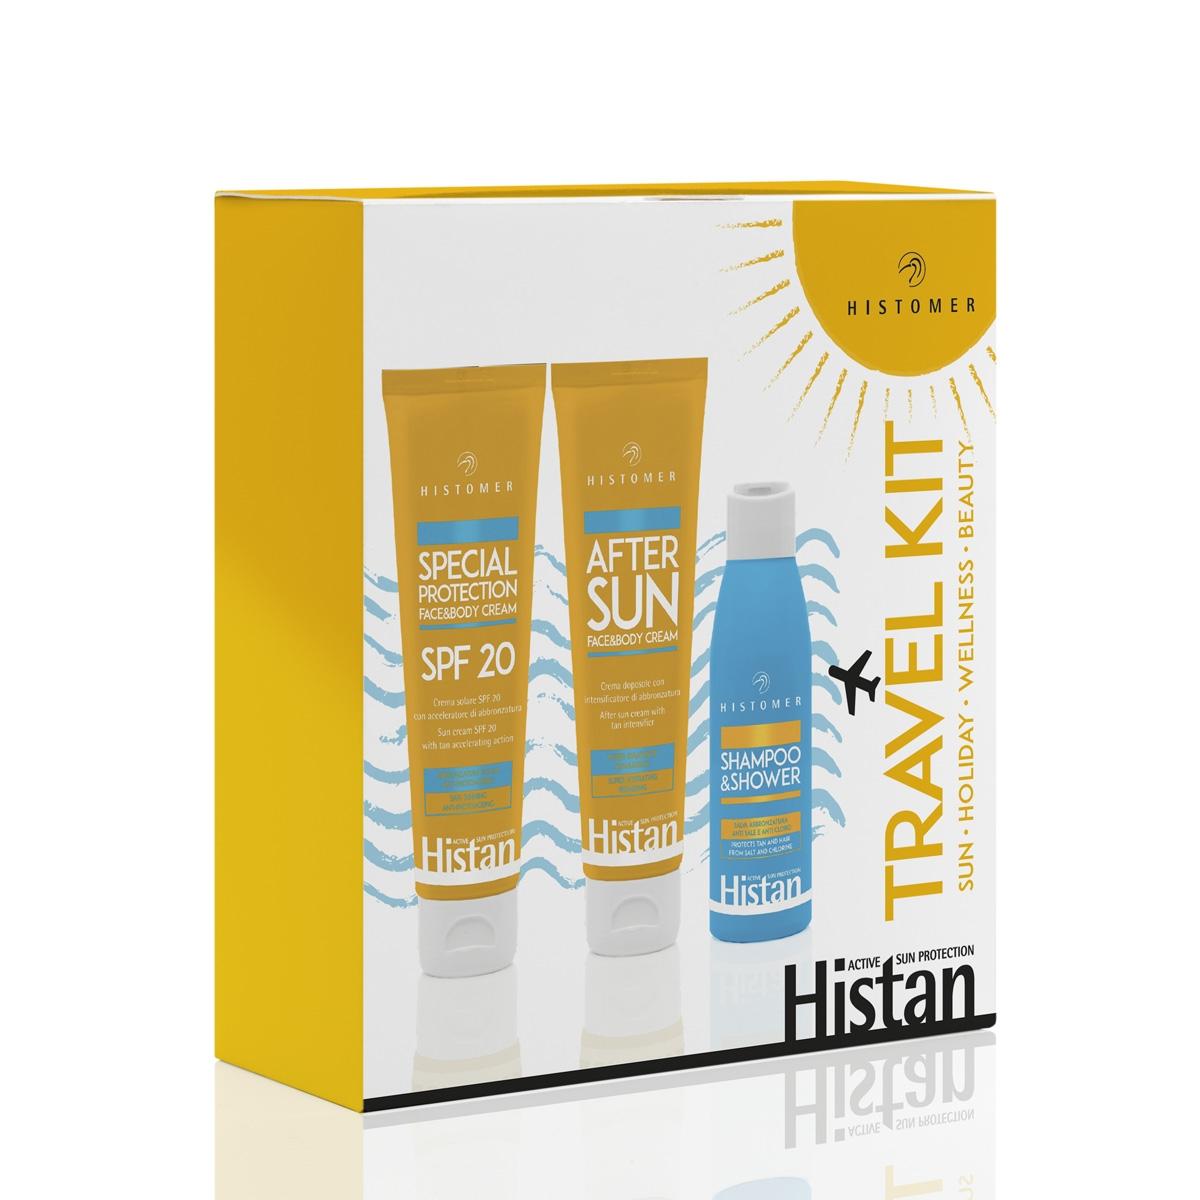 Histomer Набор Histan Travel Kit Дорожный , 3*90 мл